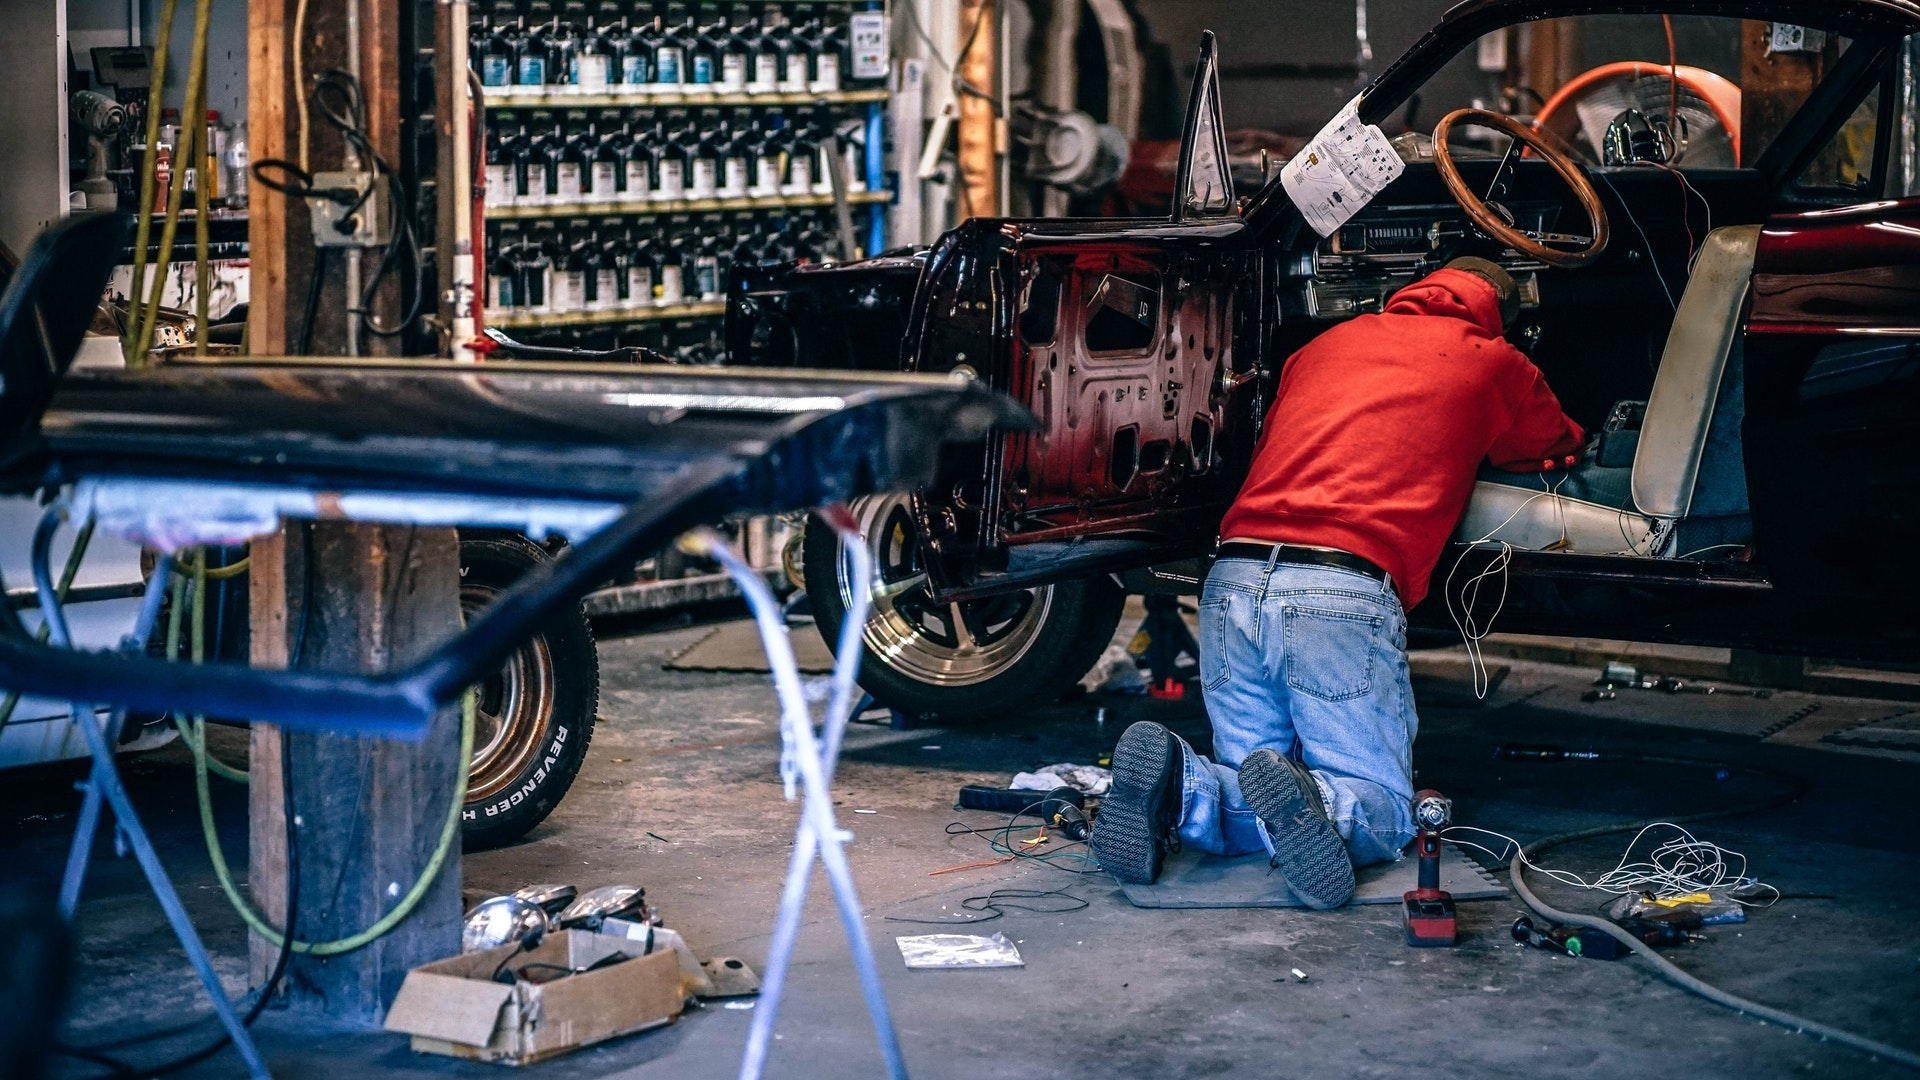 Worker strikes and a site crash dent Amazon's Prime Day shopping bonanza